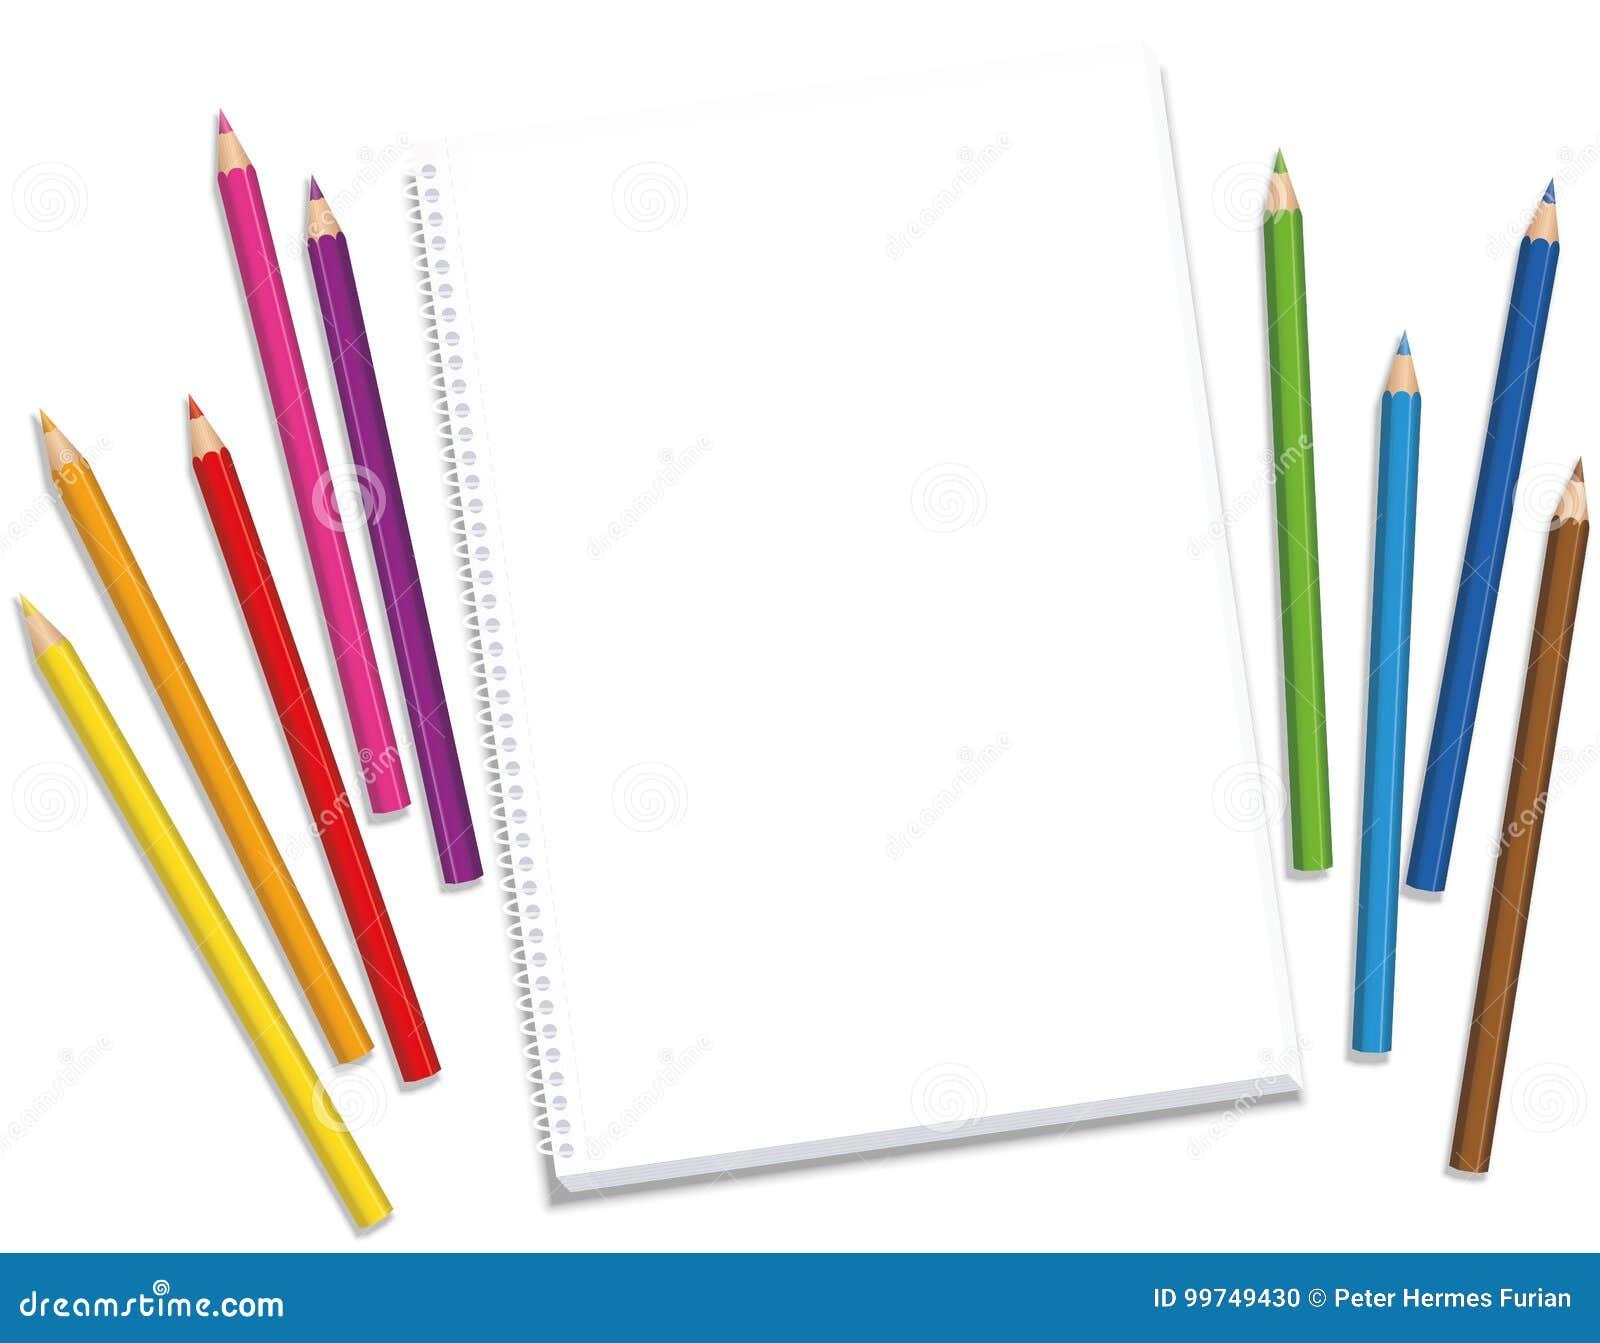 Sketchpad Crayons Blank Drawing Stock Vector - Illustration